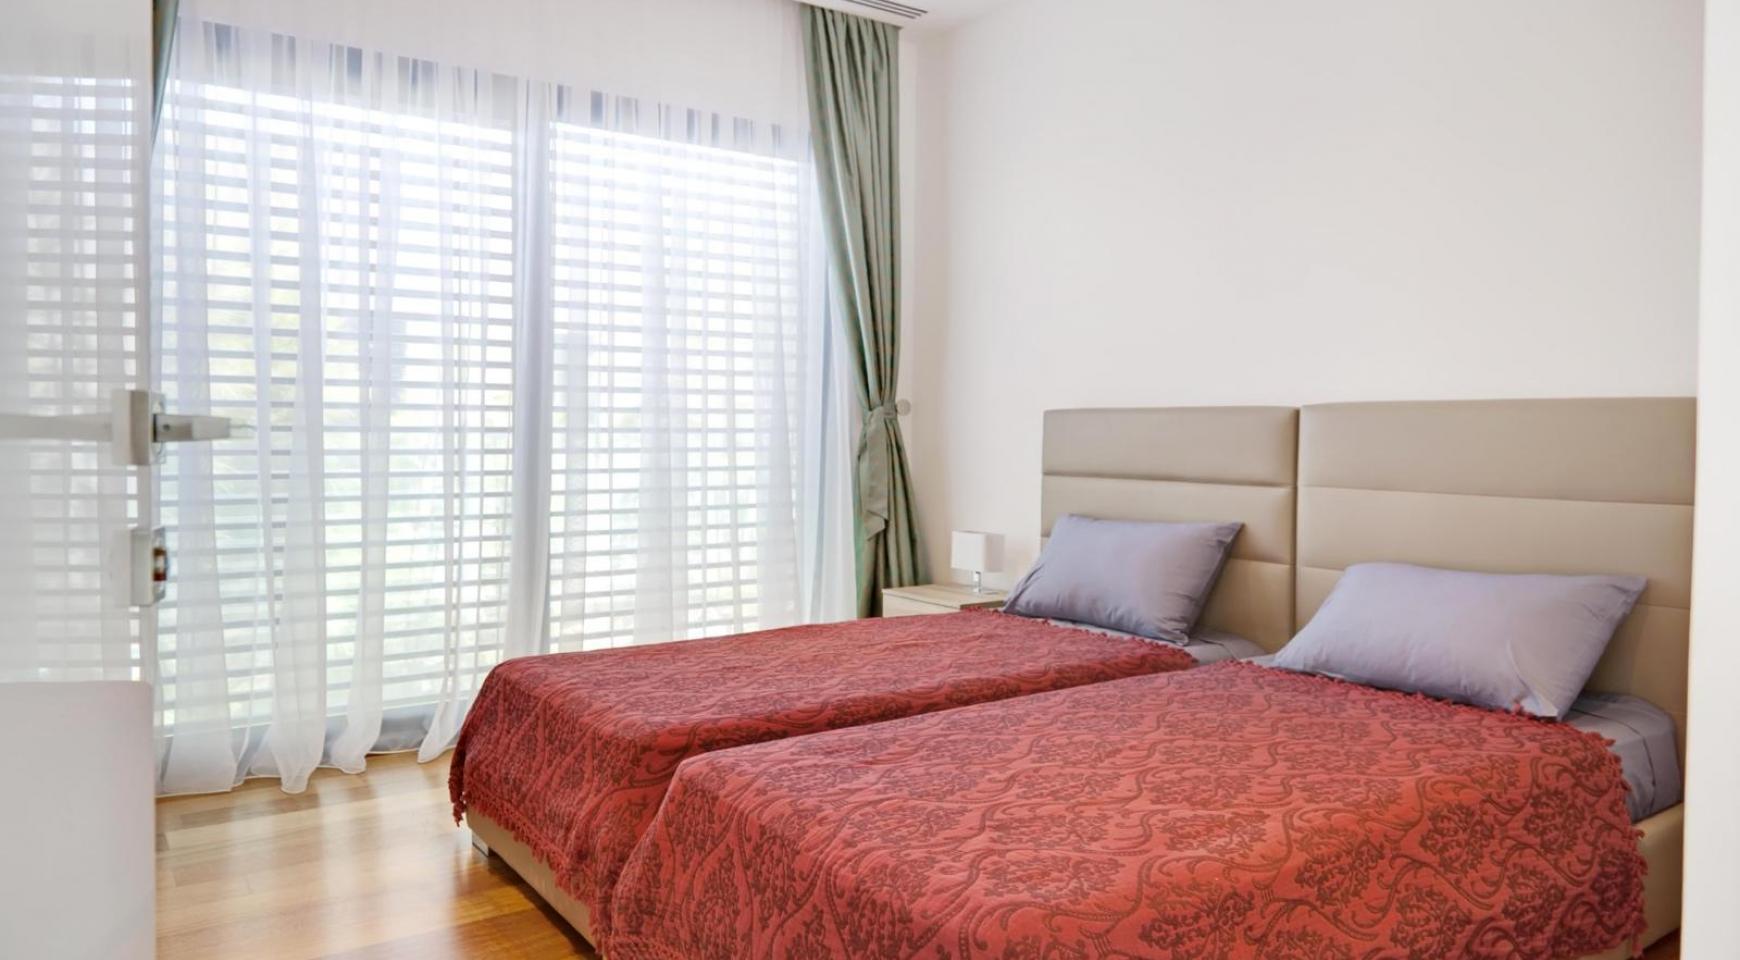 New Luxurious 4 Bedroom Villa in the Tourist Area - 39